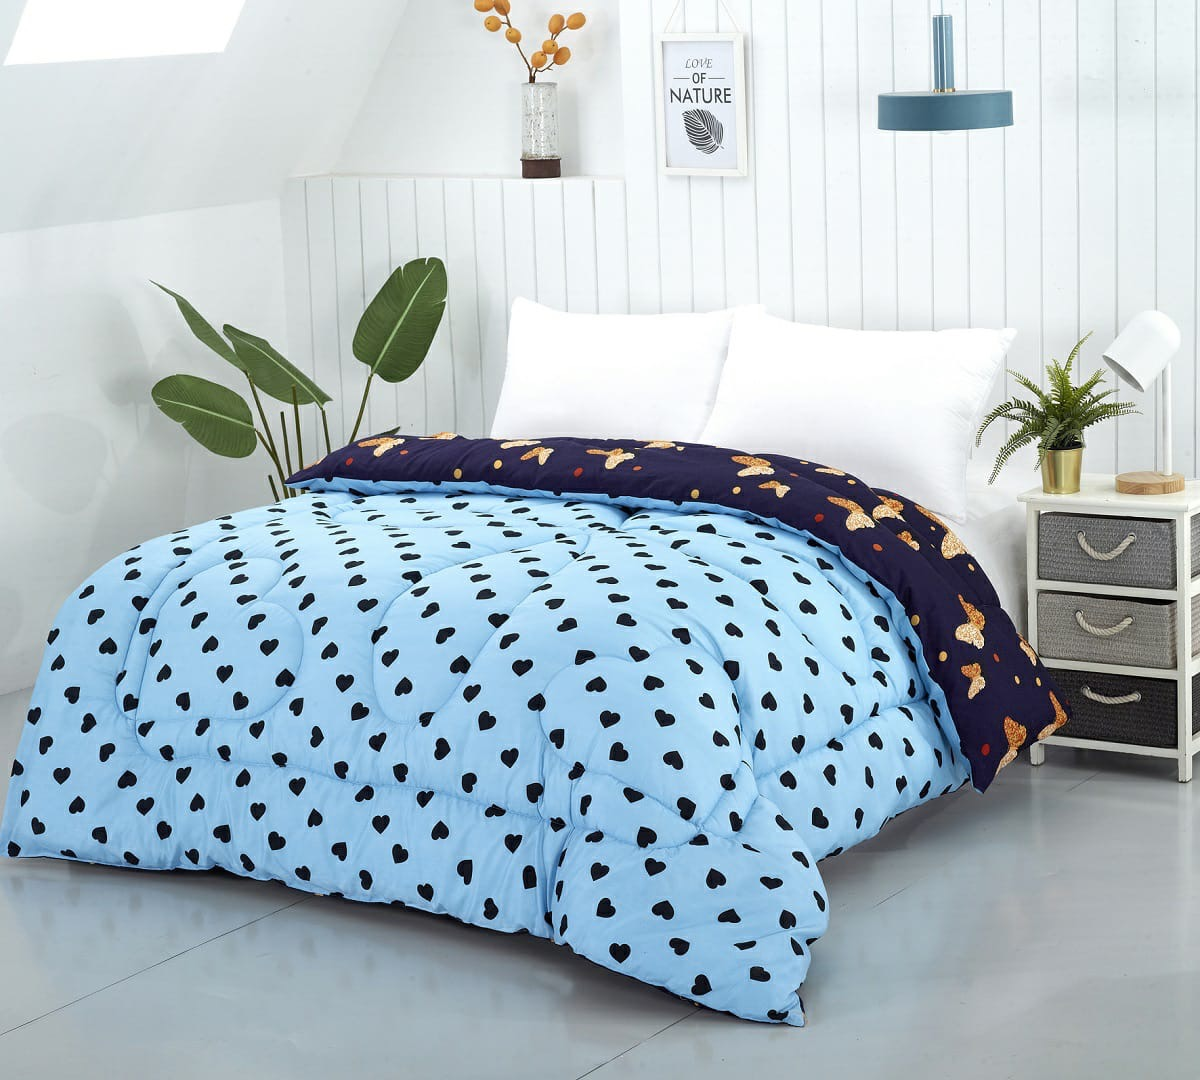 Lenjerie de pat albastra cu inimi